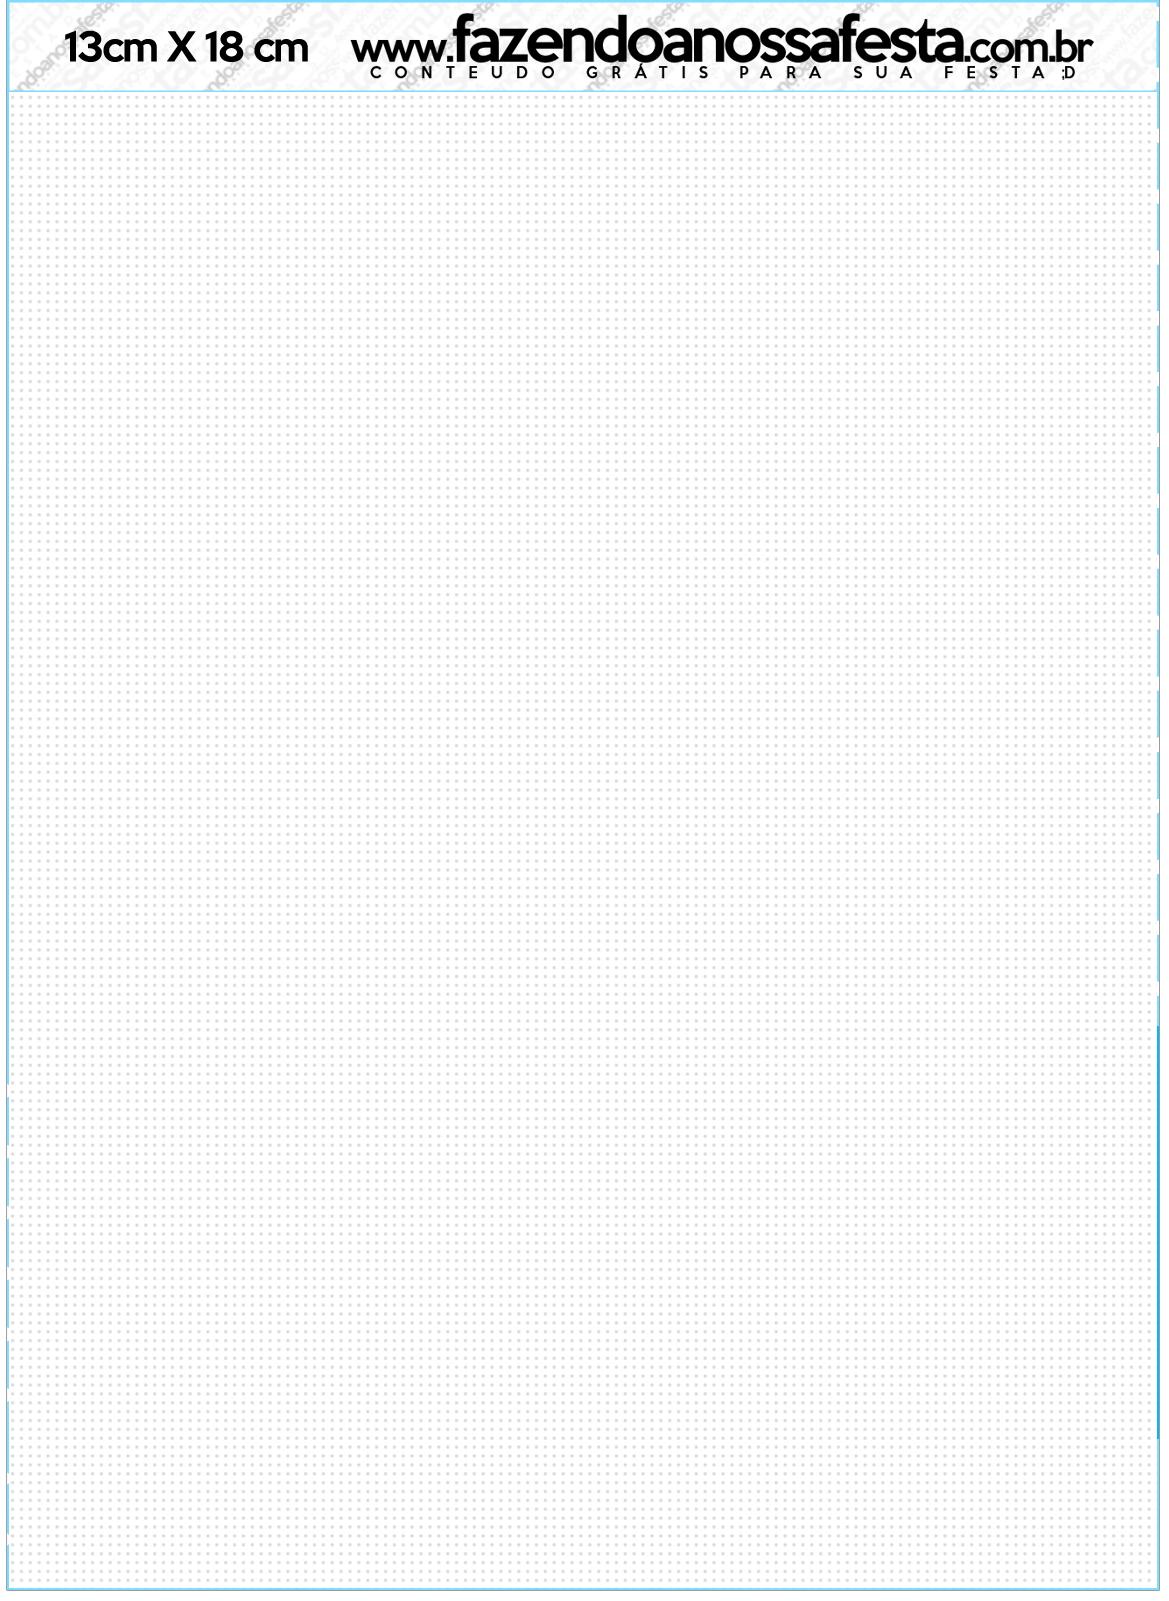 Convite com Envelope Realeza Azul